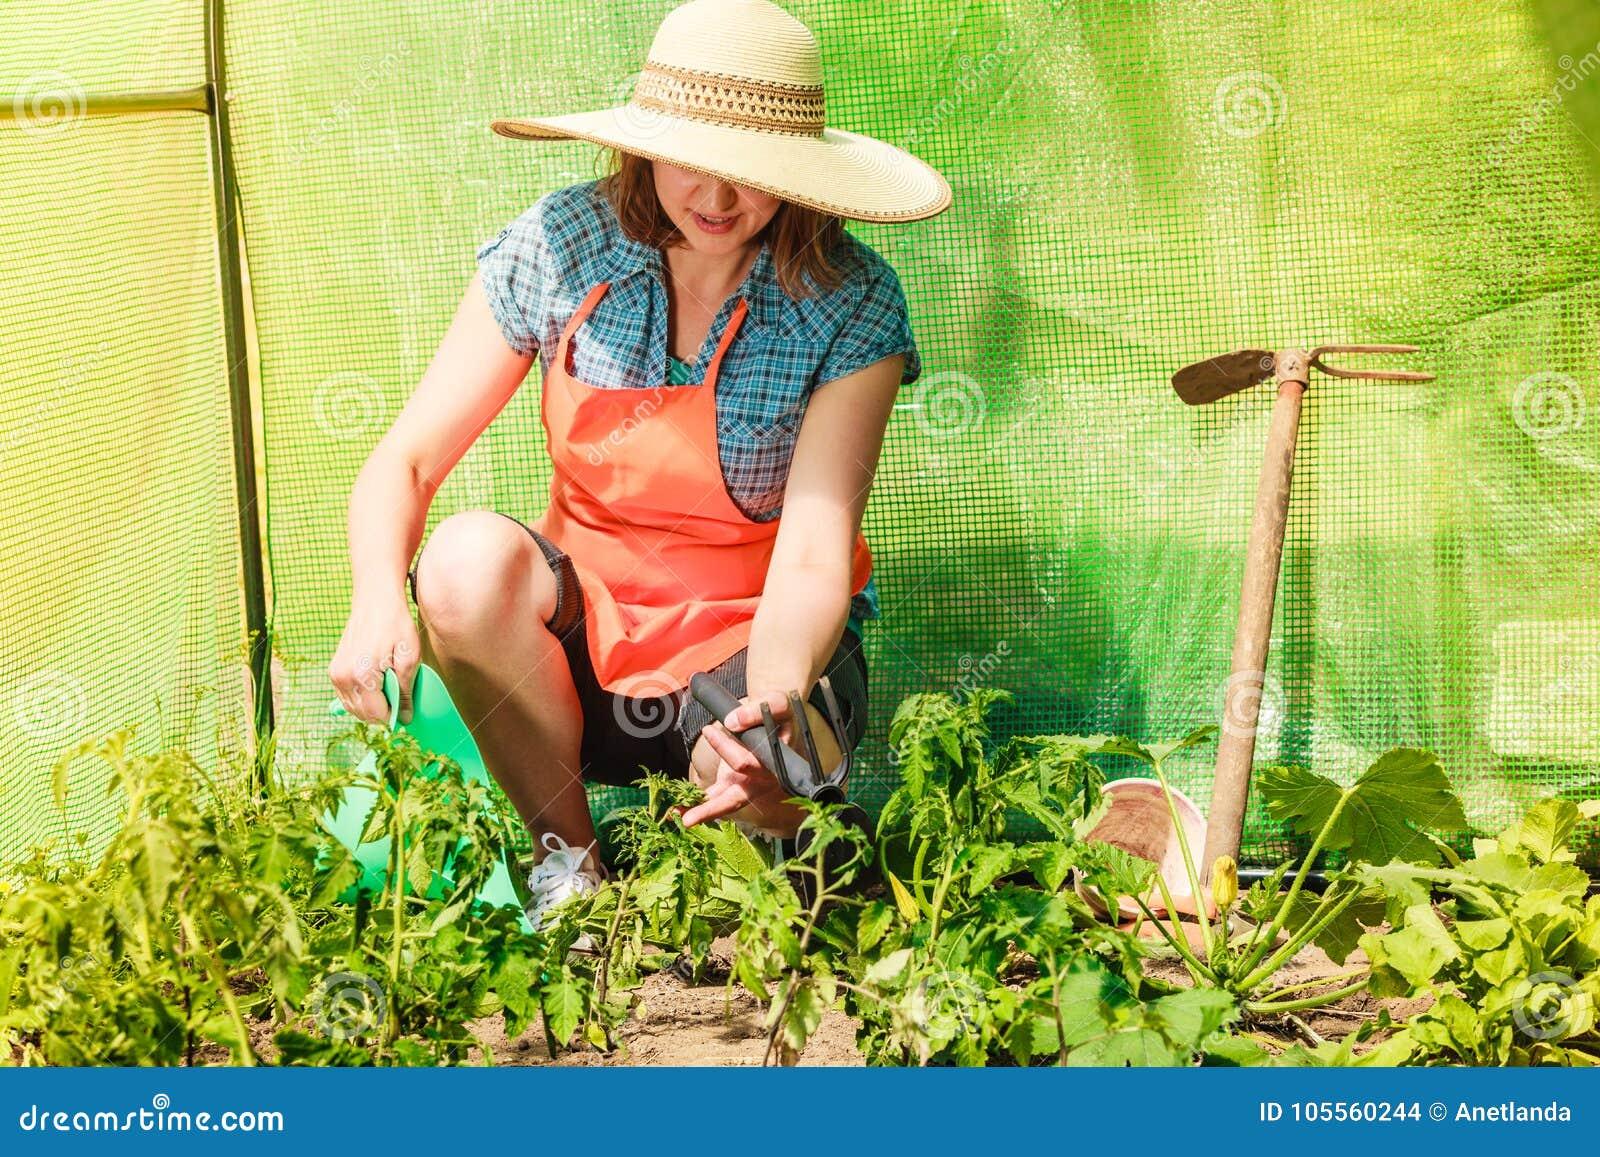 outils jardinage femme